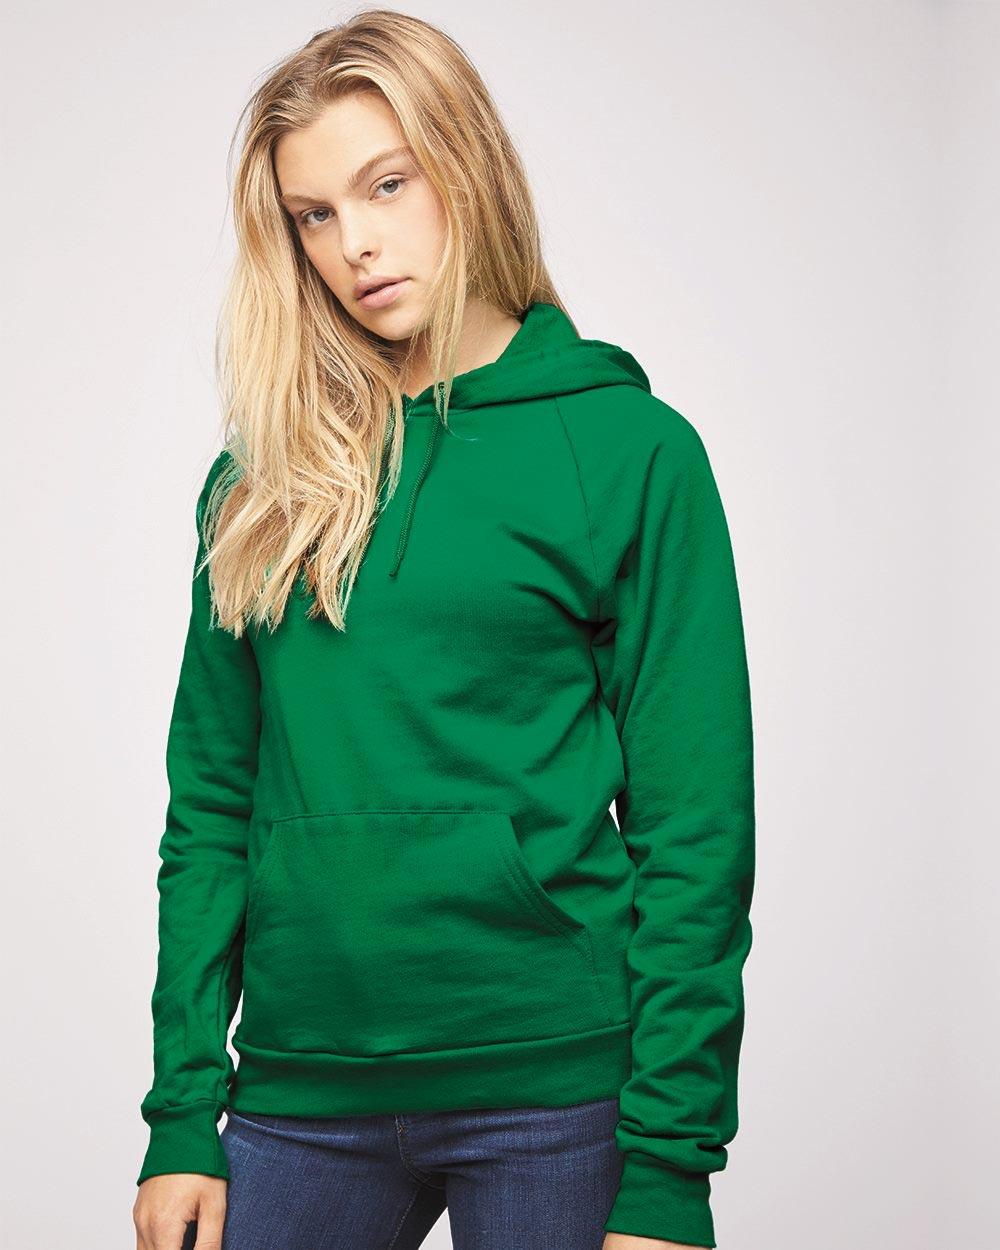 American Apparel 5495W - California Fleece Unisex Hoodie